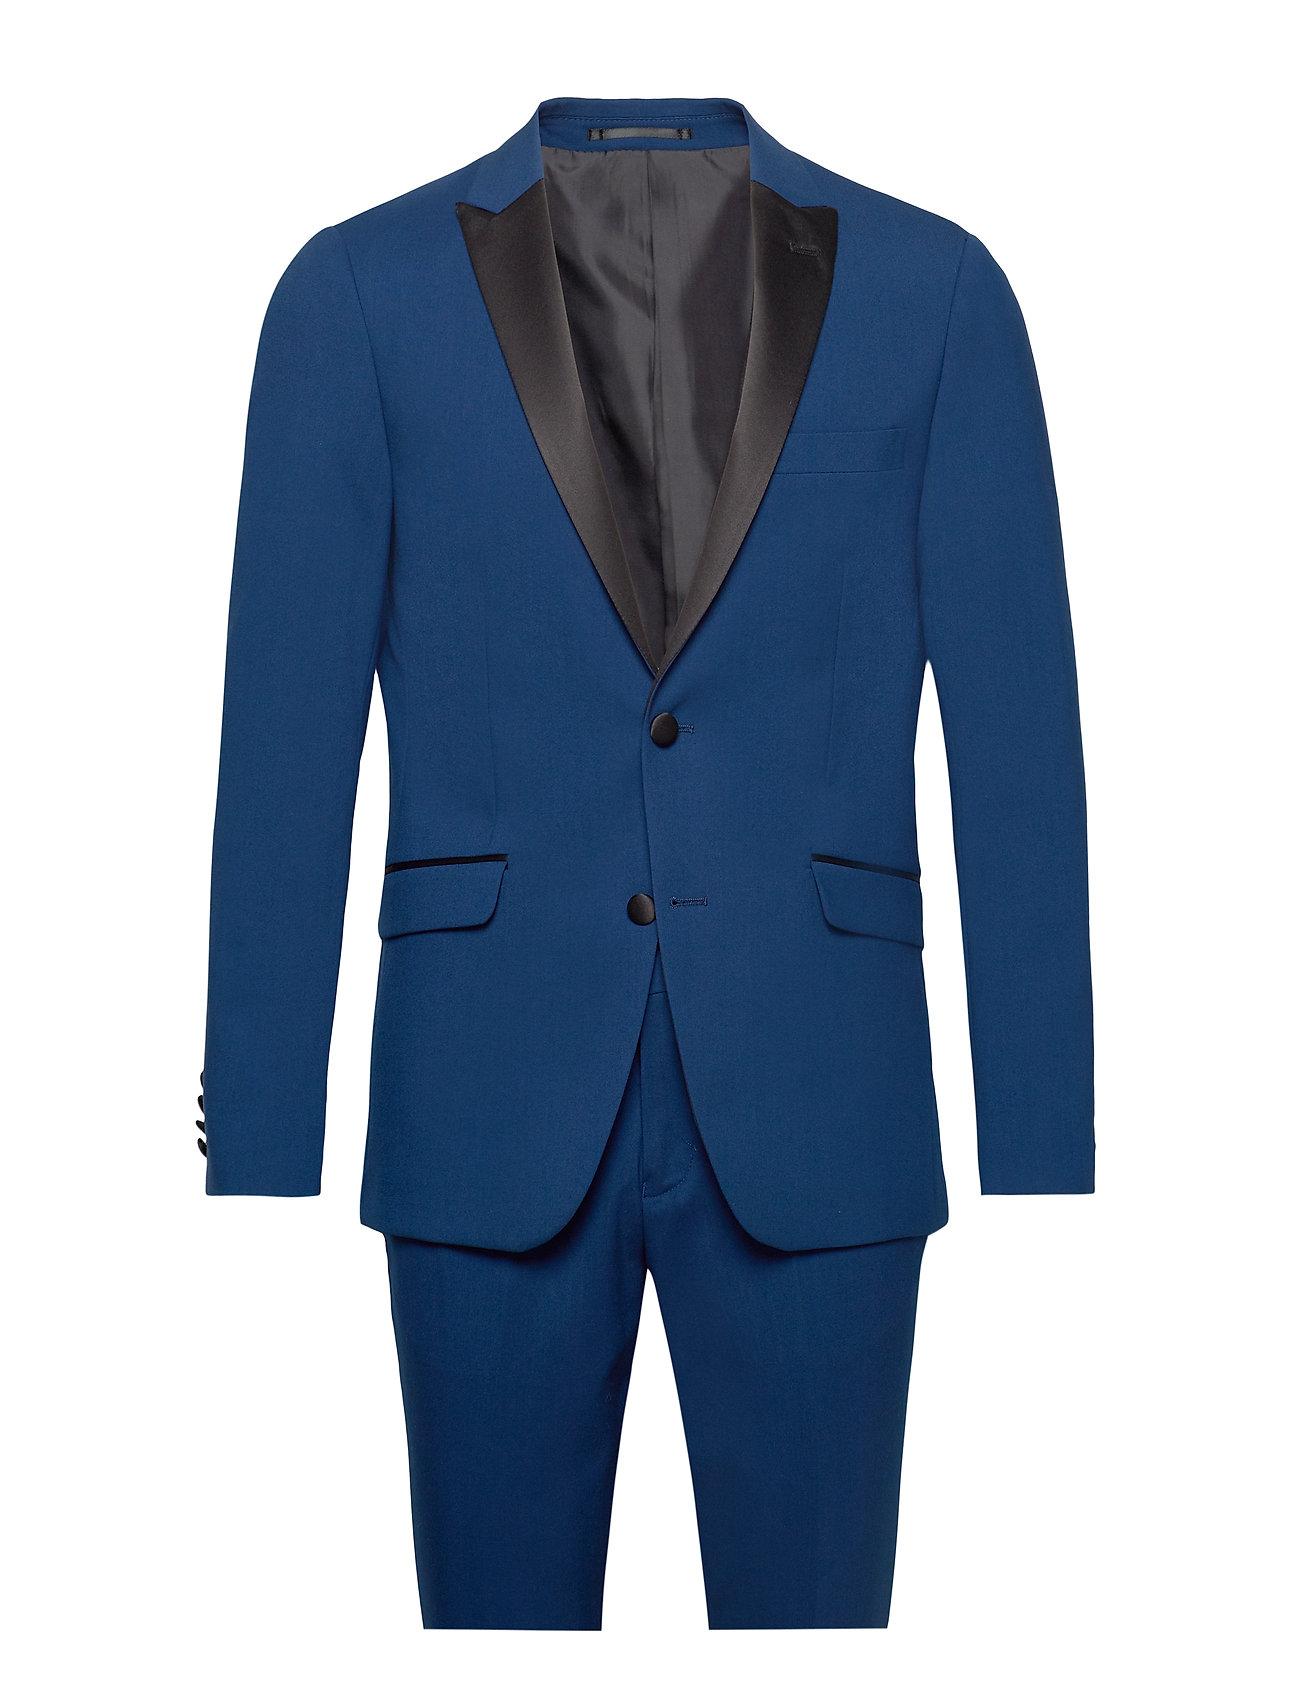 Lindbergh Tuxedo - BLUE